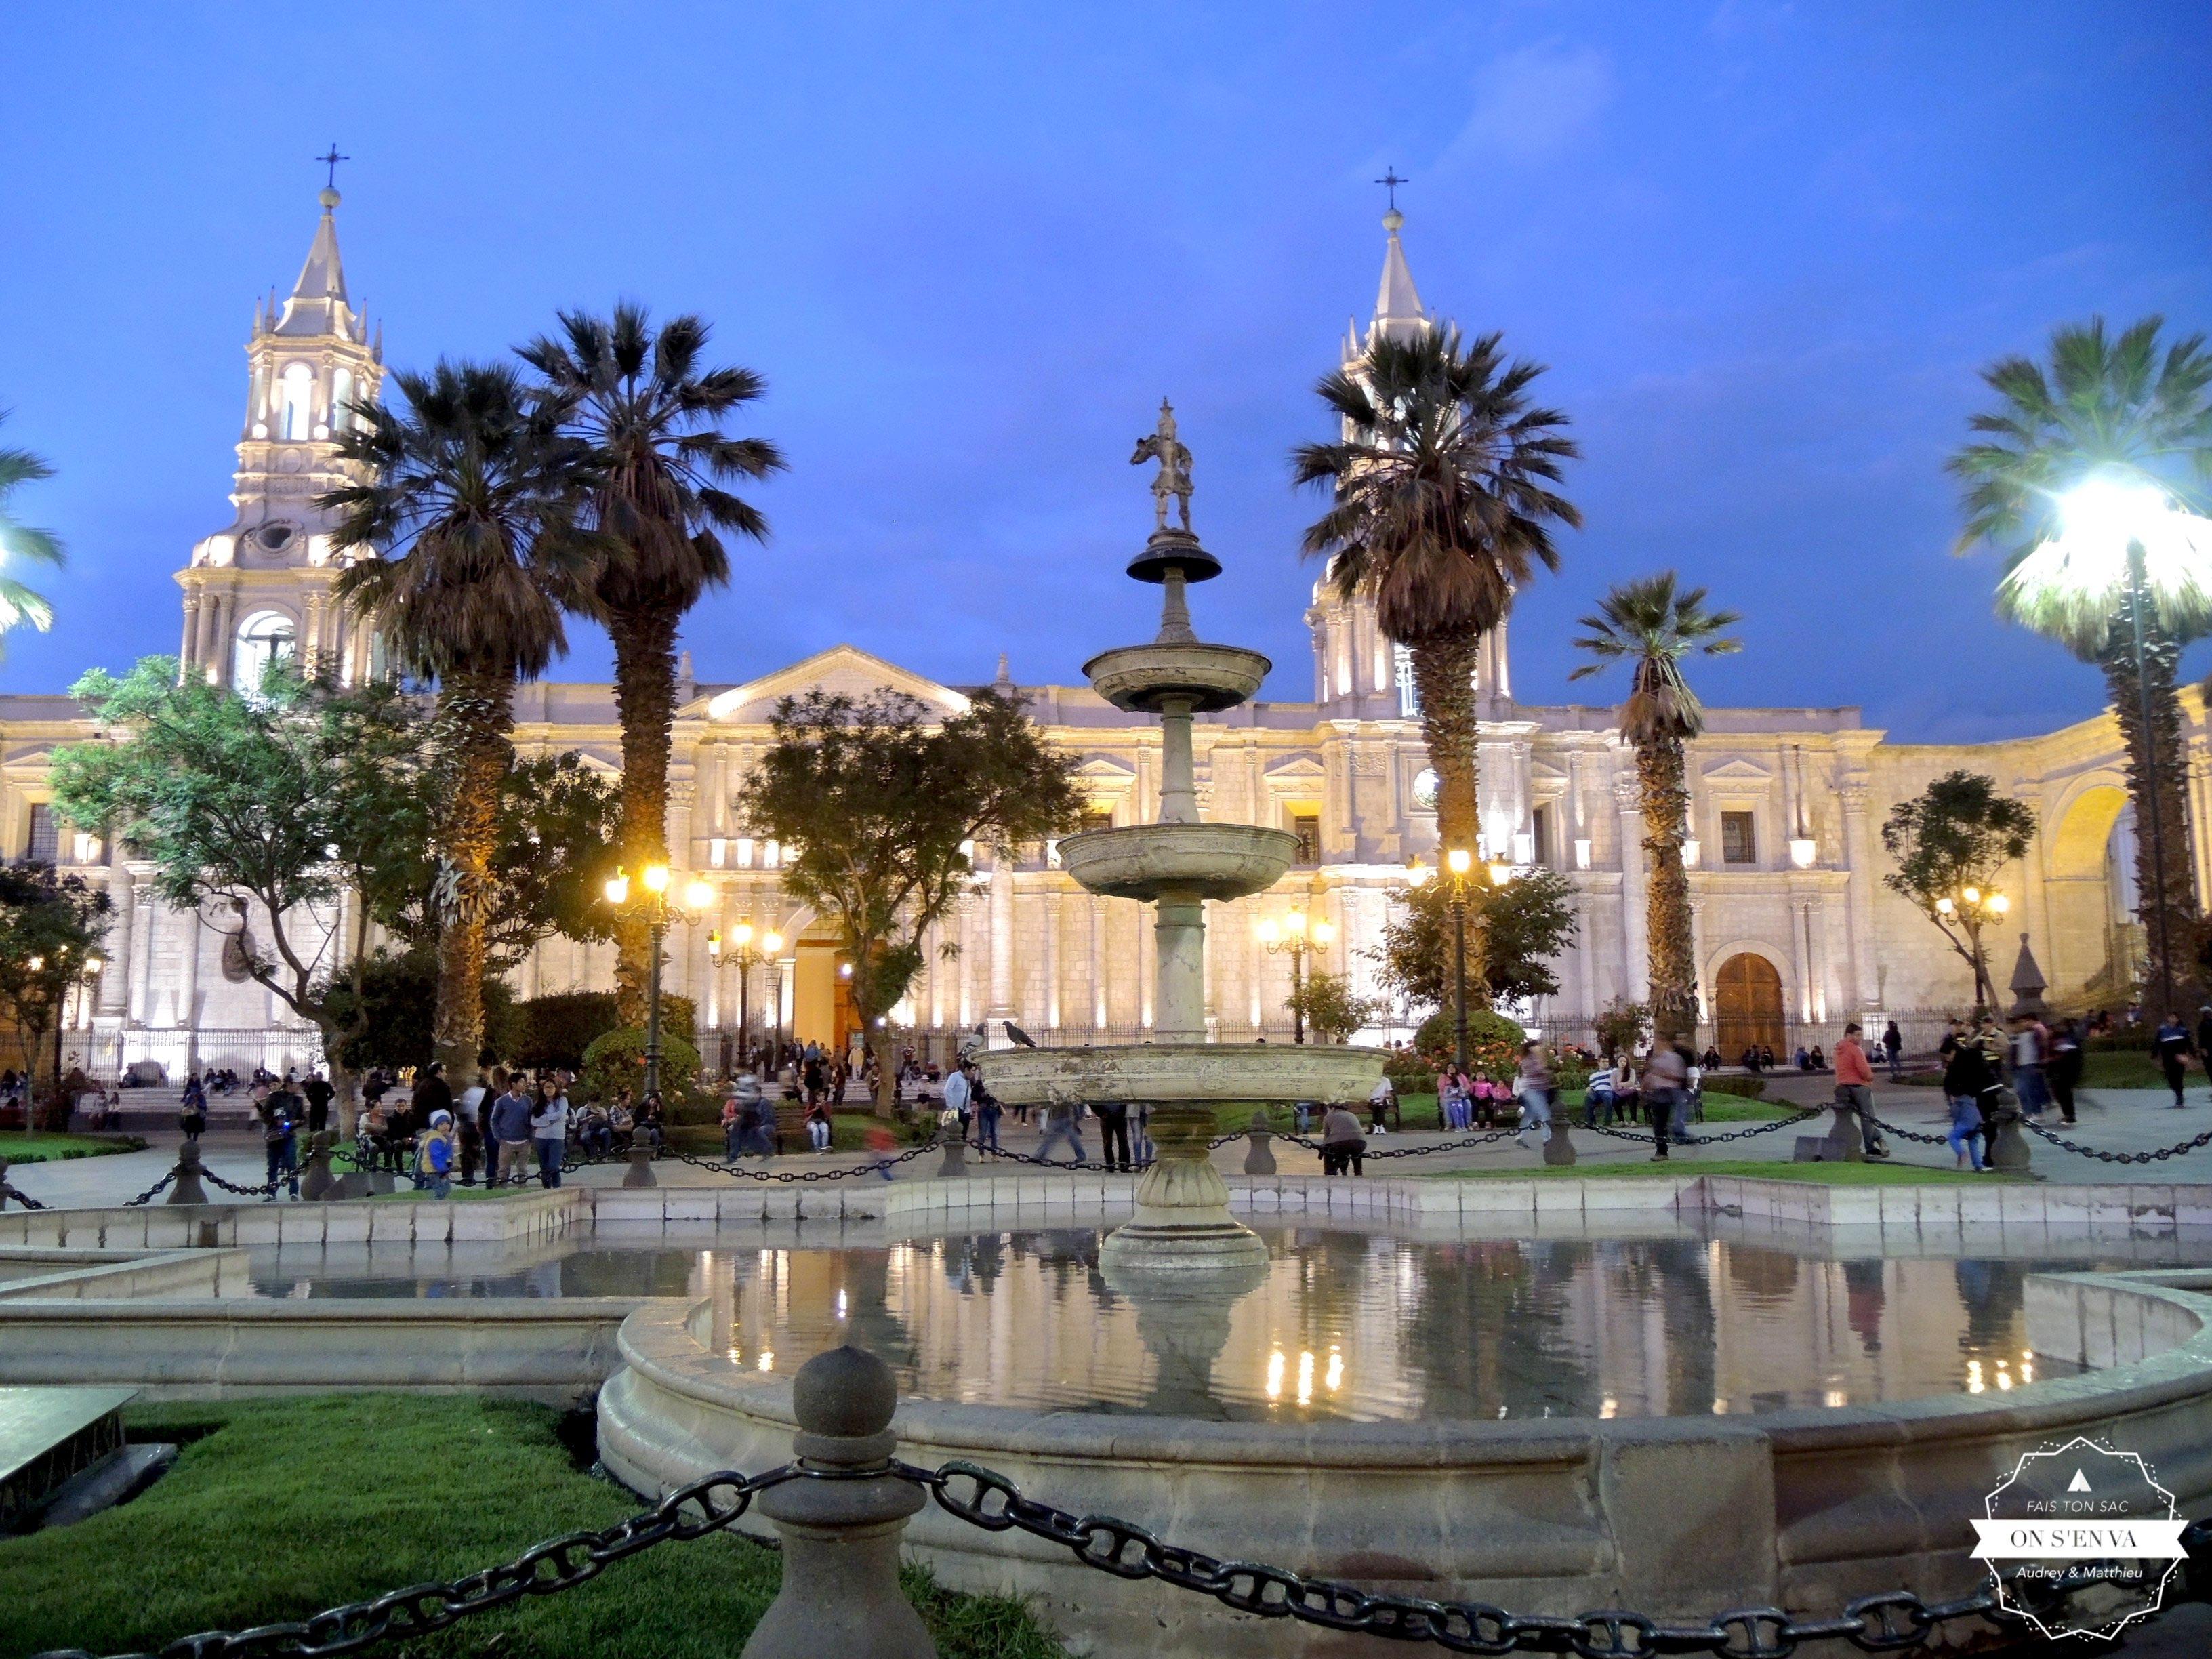 Retour à Arequipa